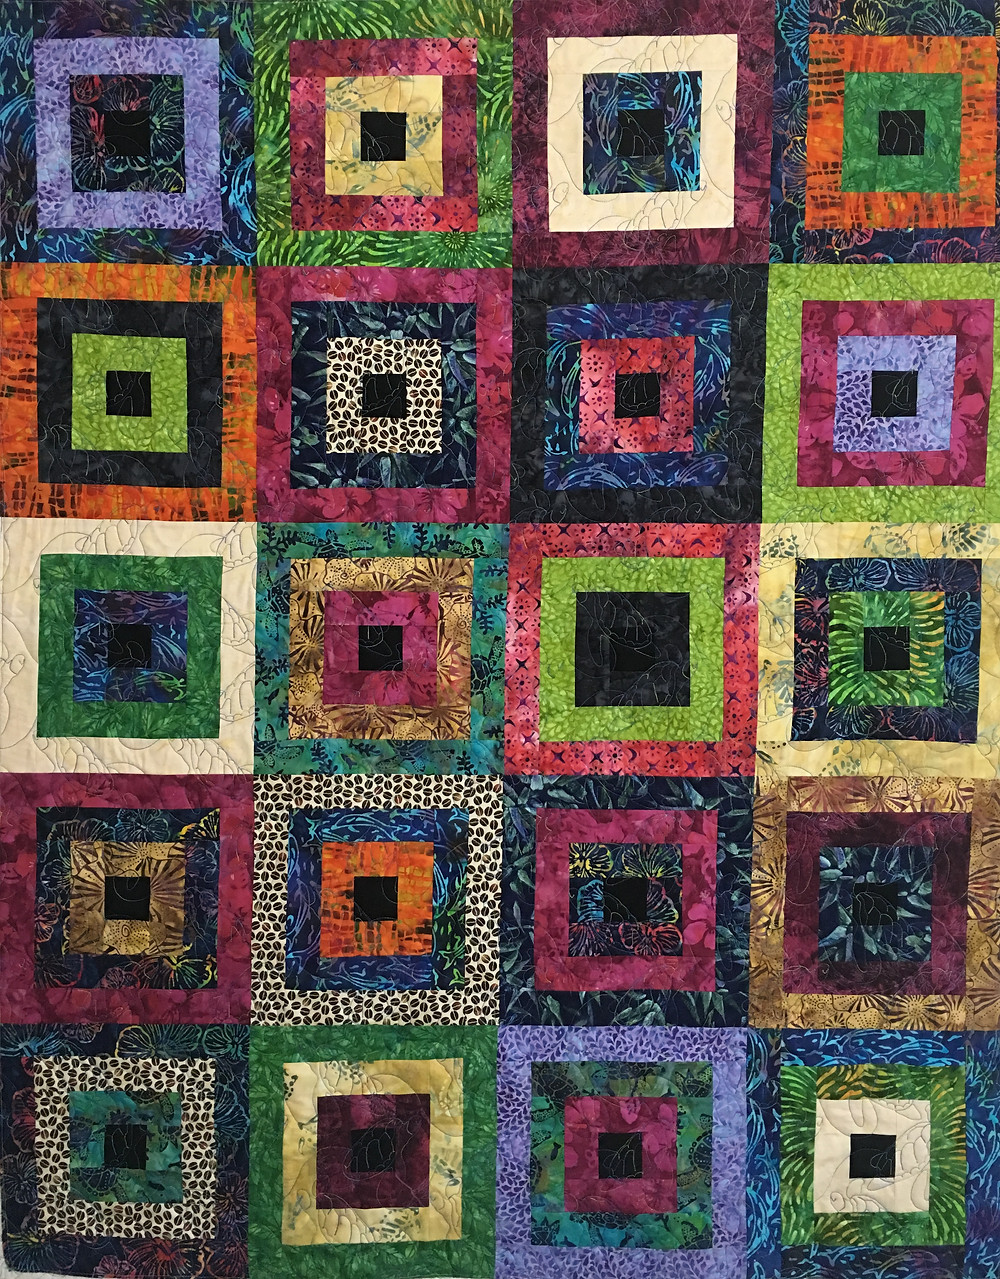 Around the Village Square Quilt by Mary VanHoomissen